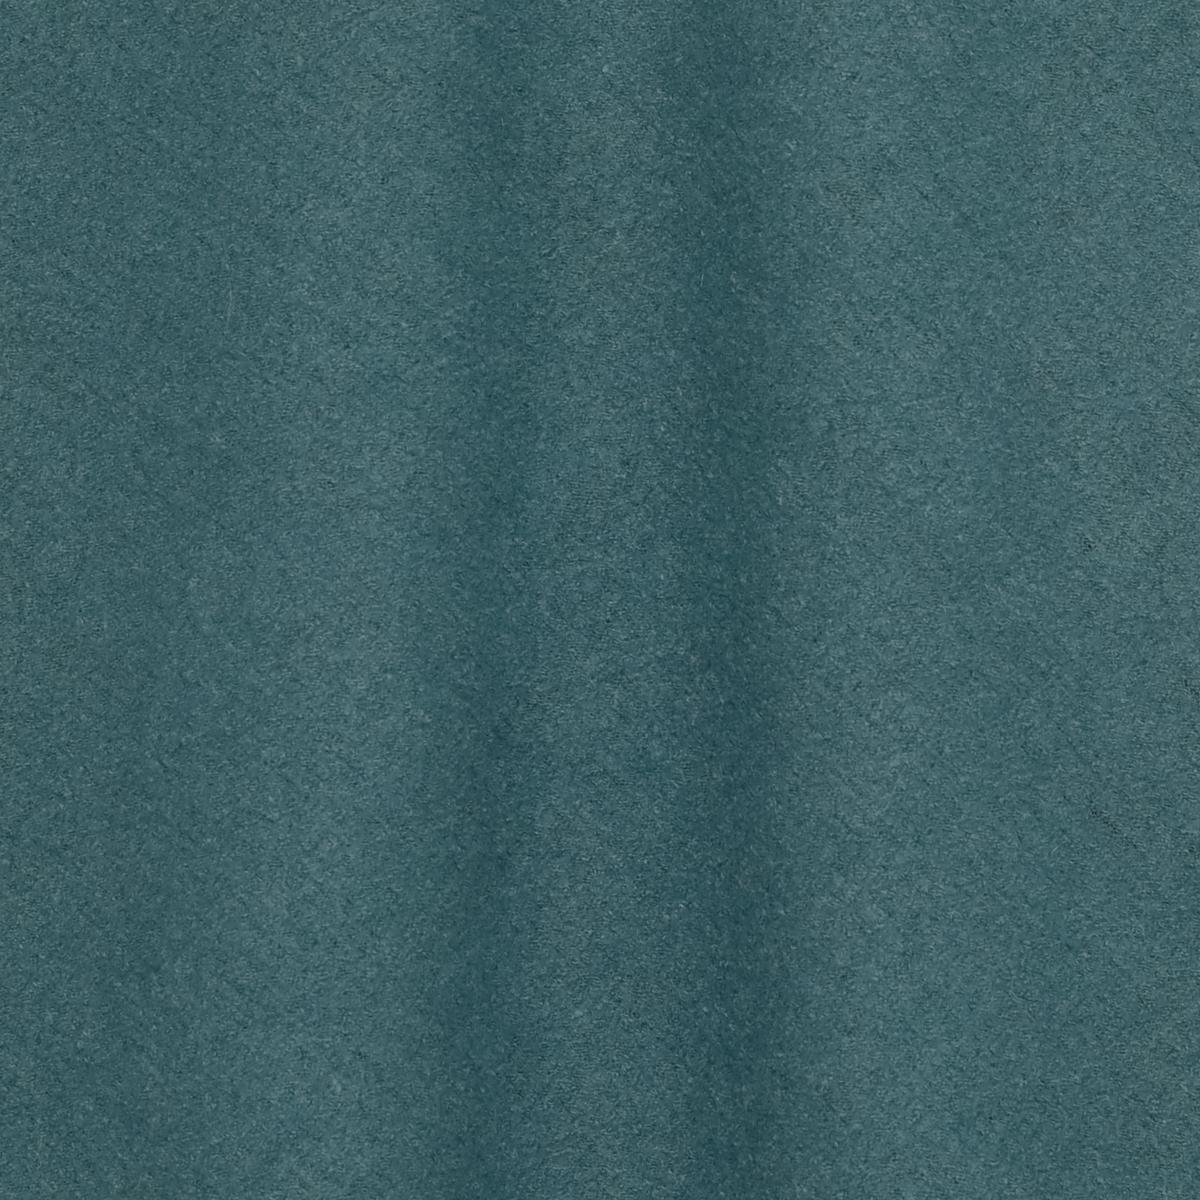 Мягкий вискозно-шерстяной лоден